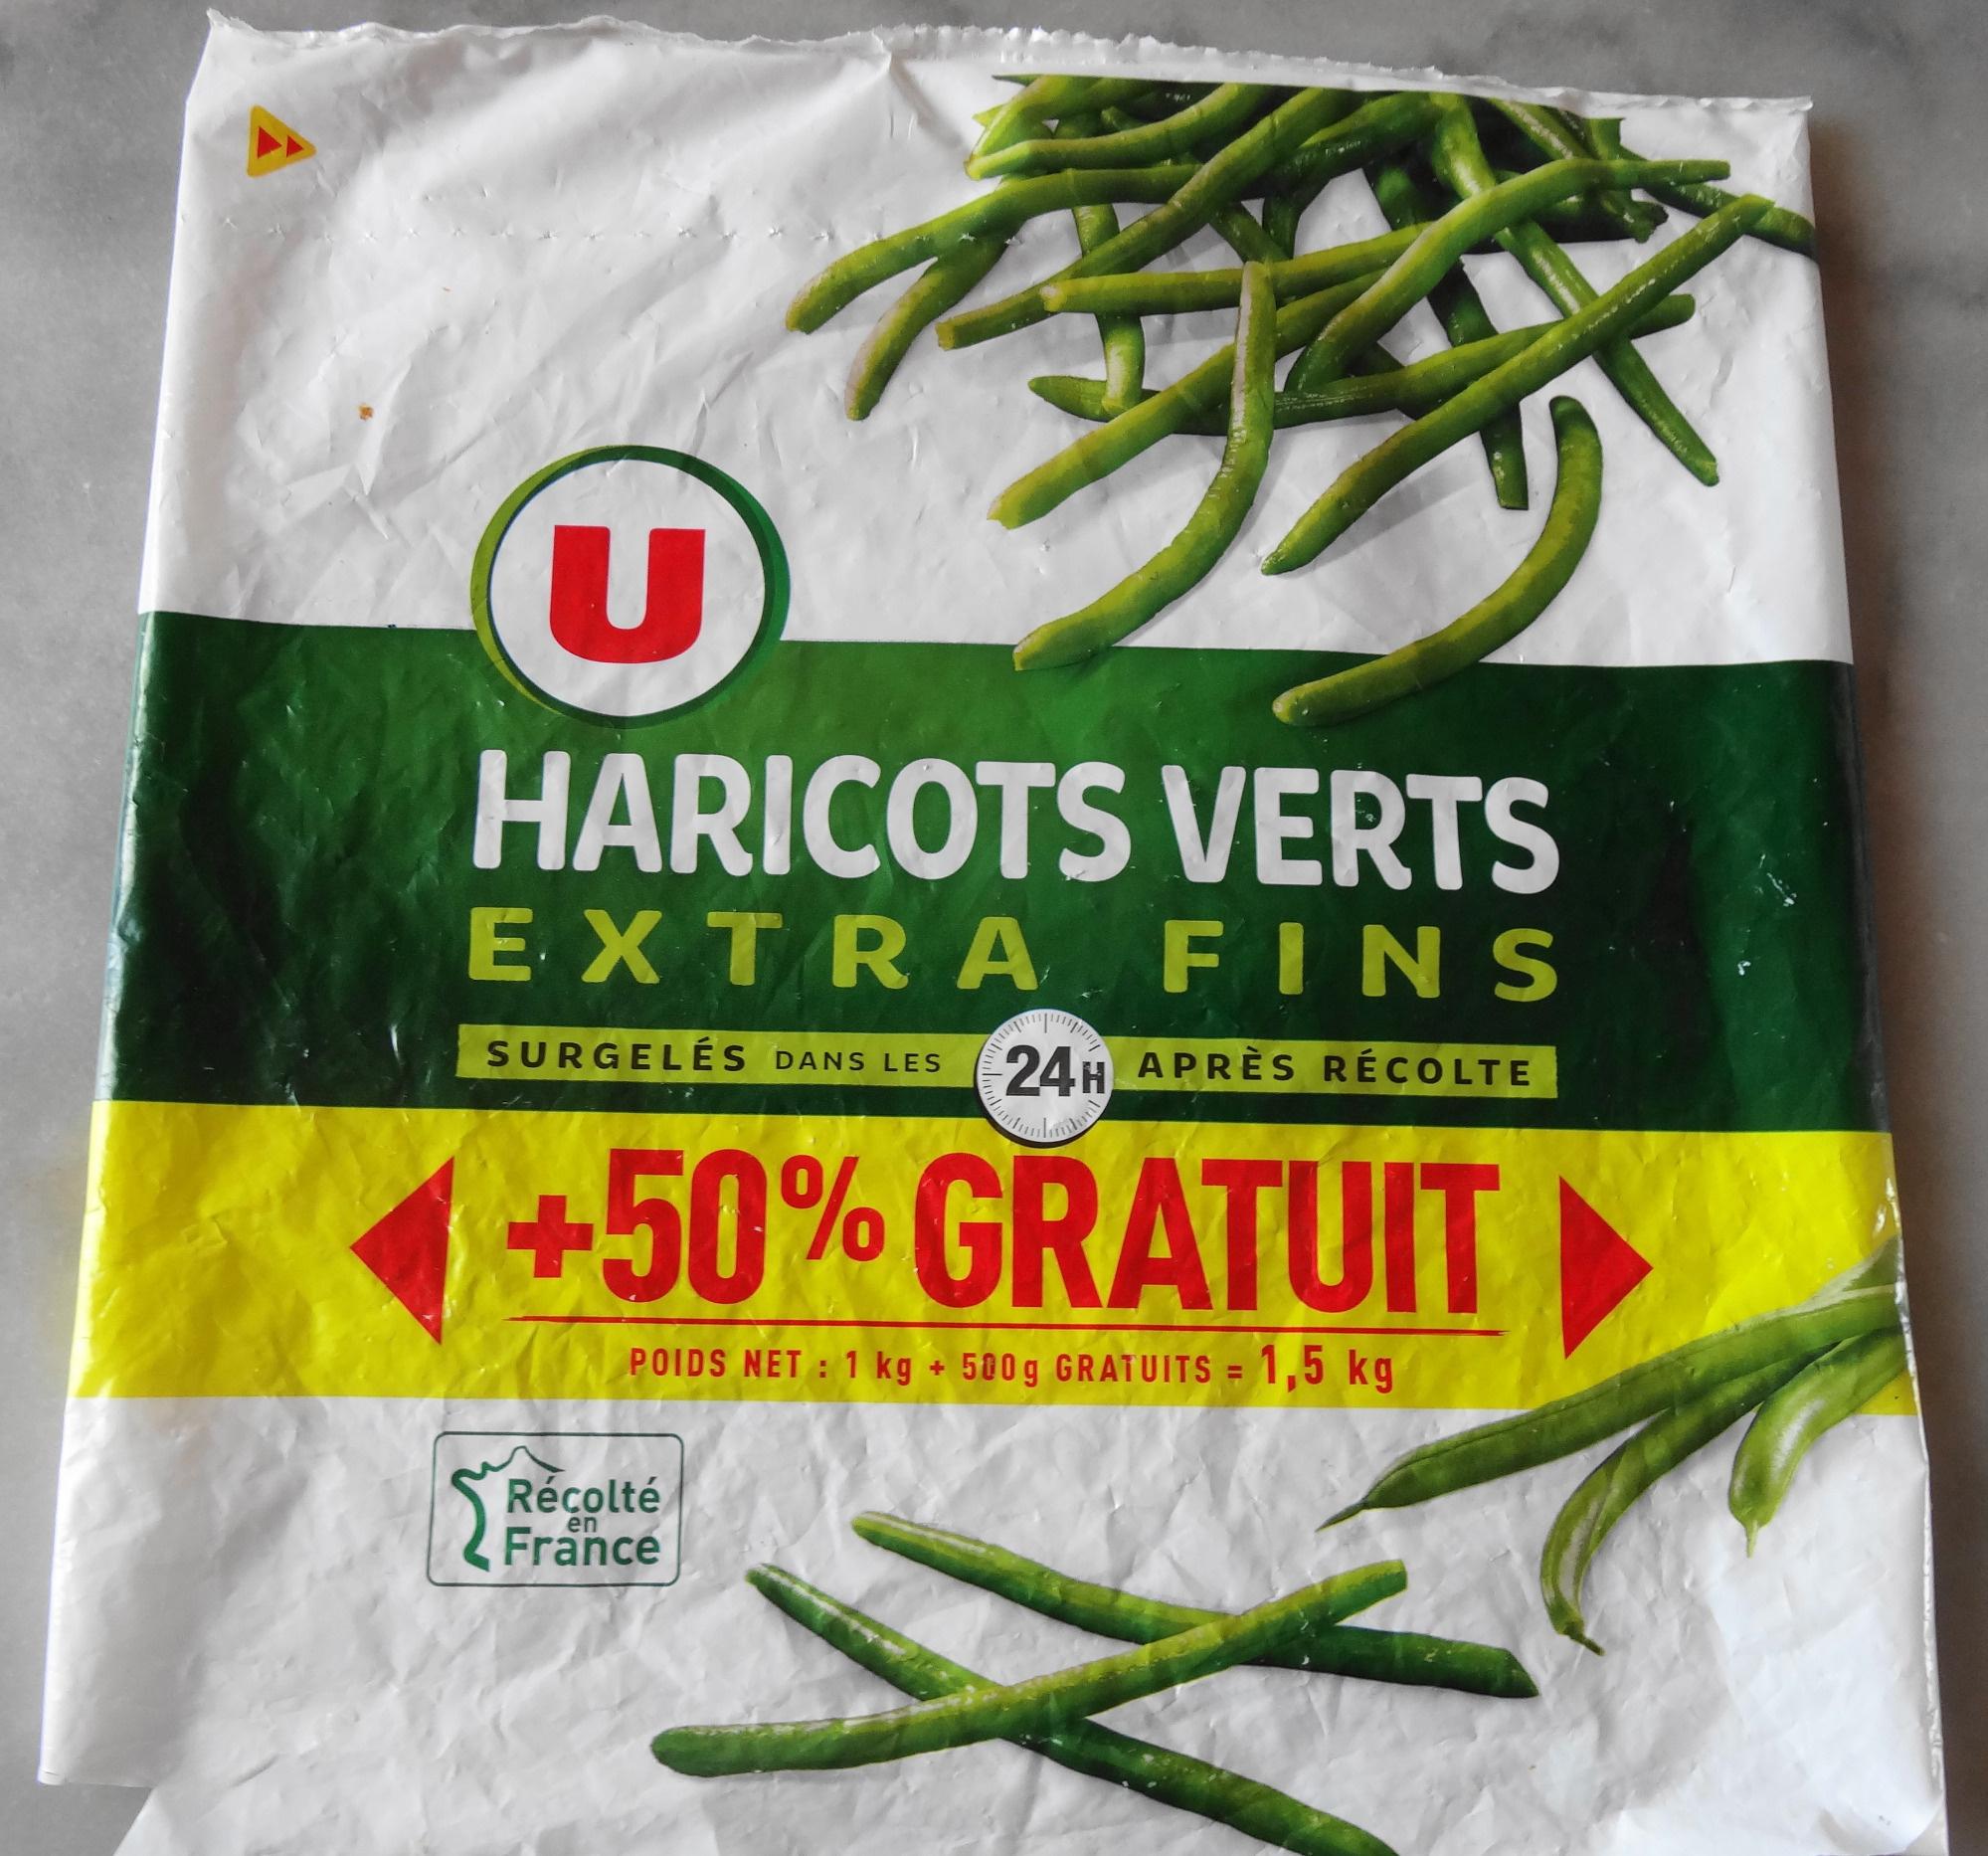 haricots verts extra fins surgel s 50 gratuit u 1 5 kg. Black Bedroom Furniture Sets. Home Design Ideas